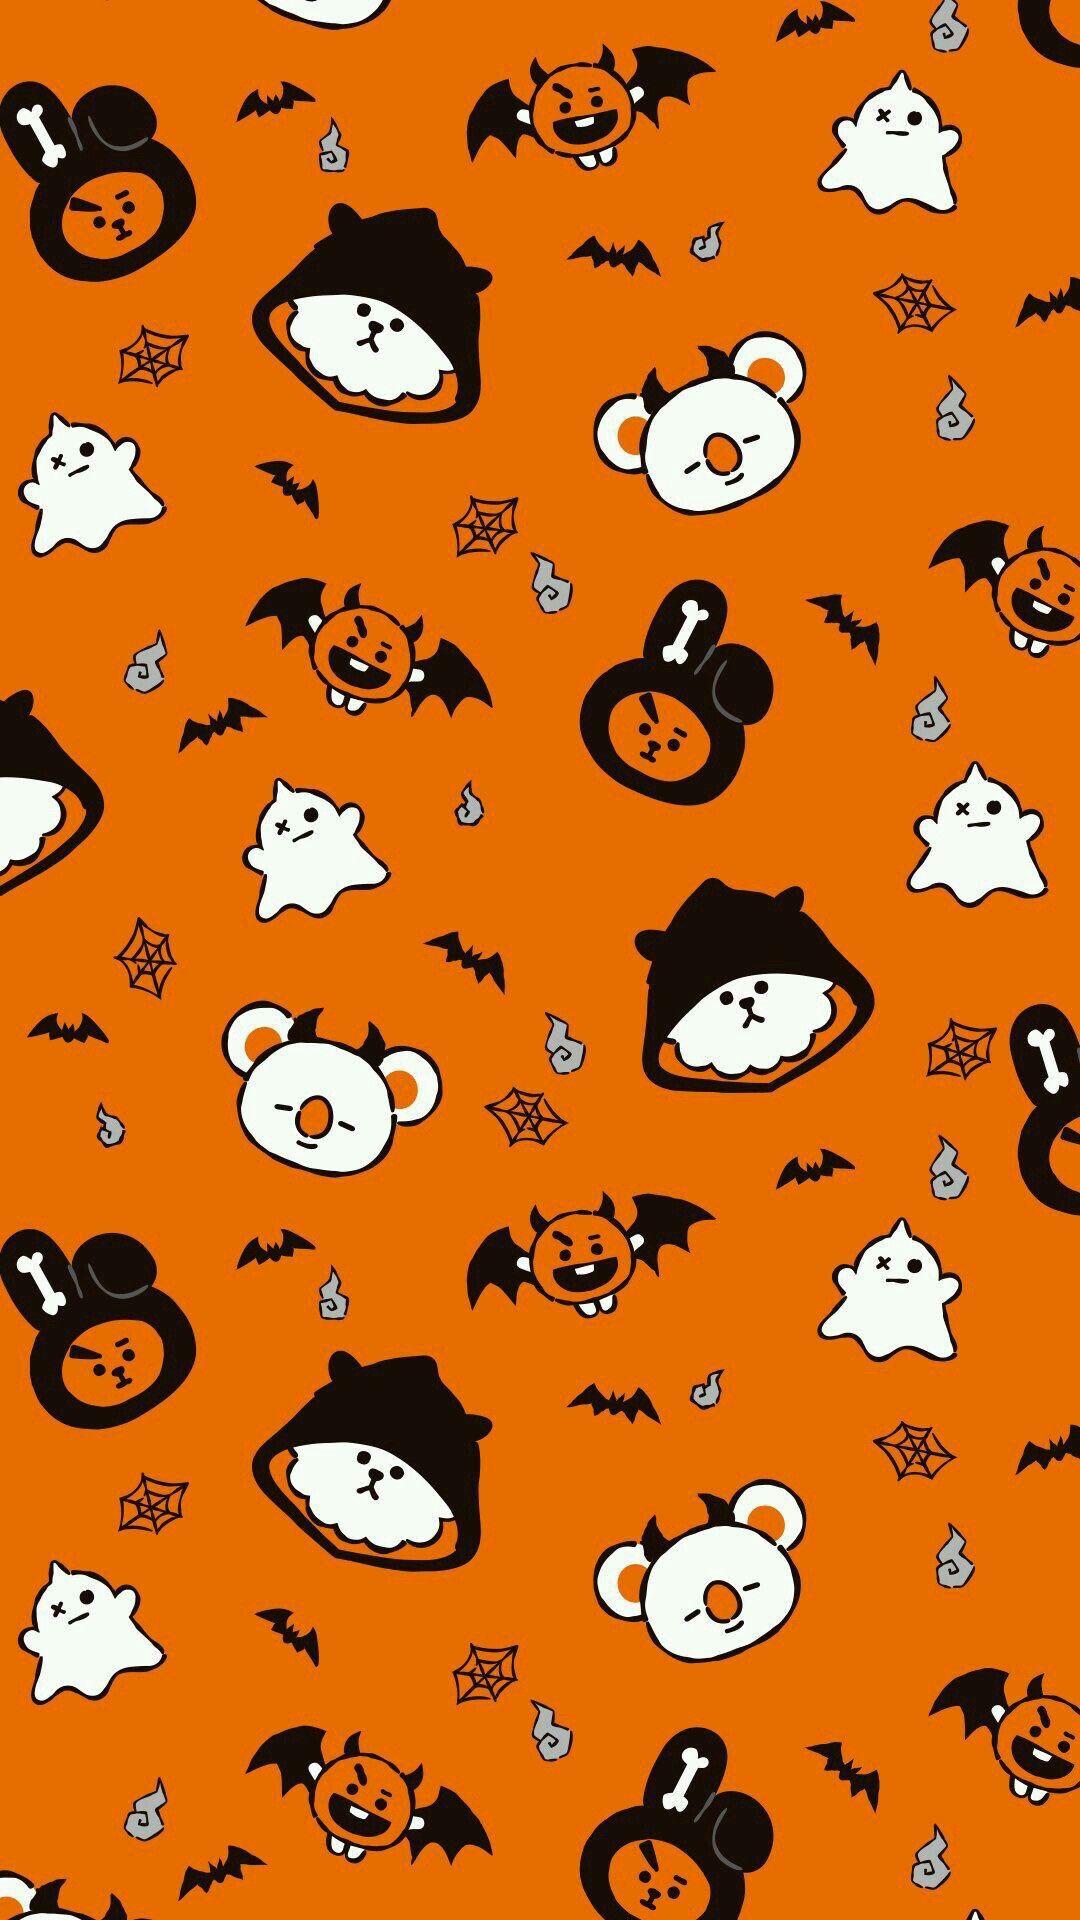 Aririuu ƥihtyeyayeѕt Bts Rj Bt21 Twitter Bangtan Bts Wallpapers Kawaii Aesthet Fondos De Halloween Ilustracion De Halloween Pantallas De Halloween